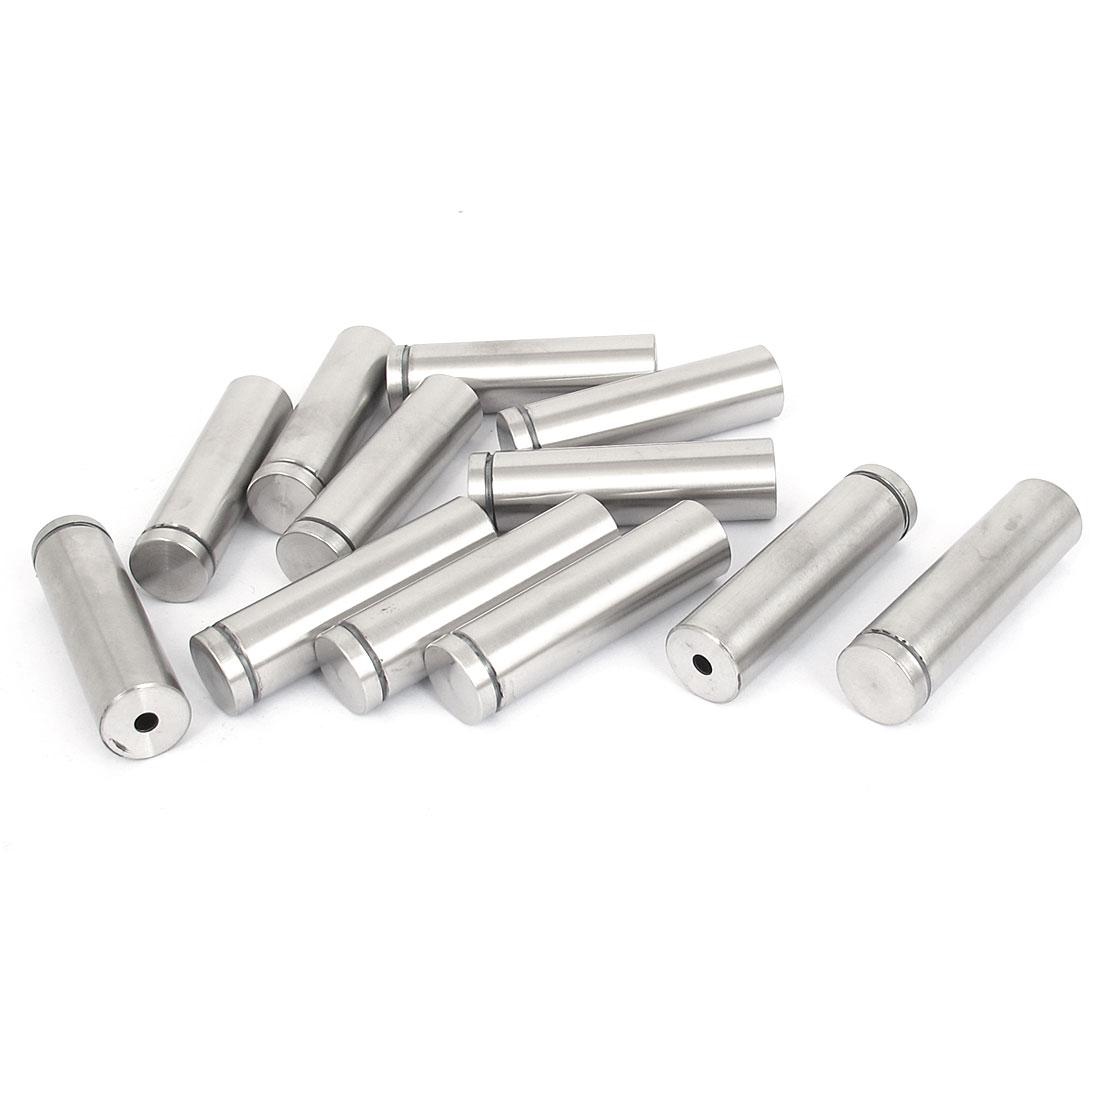 19mm x 70mm Stainless Steel Advertising Frameless Glass Standoff Pins 12pcs